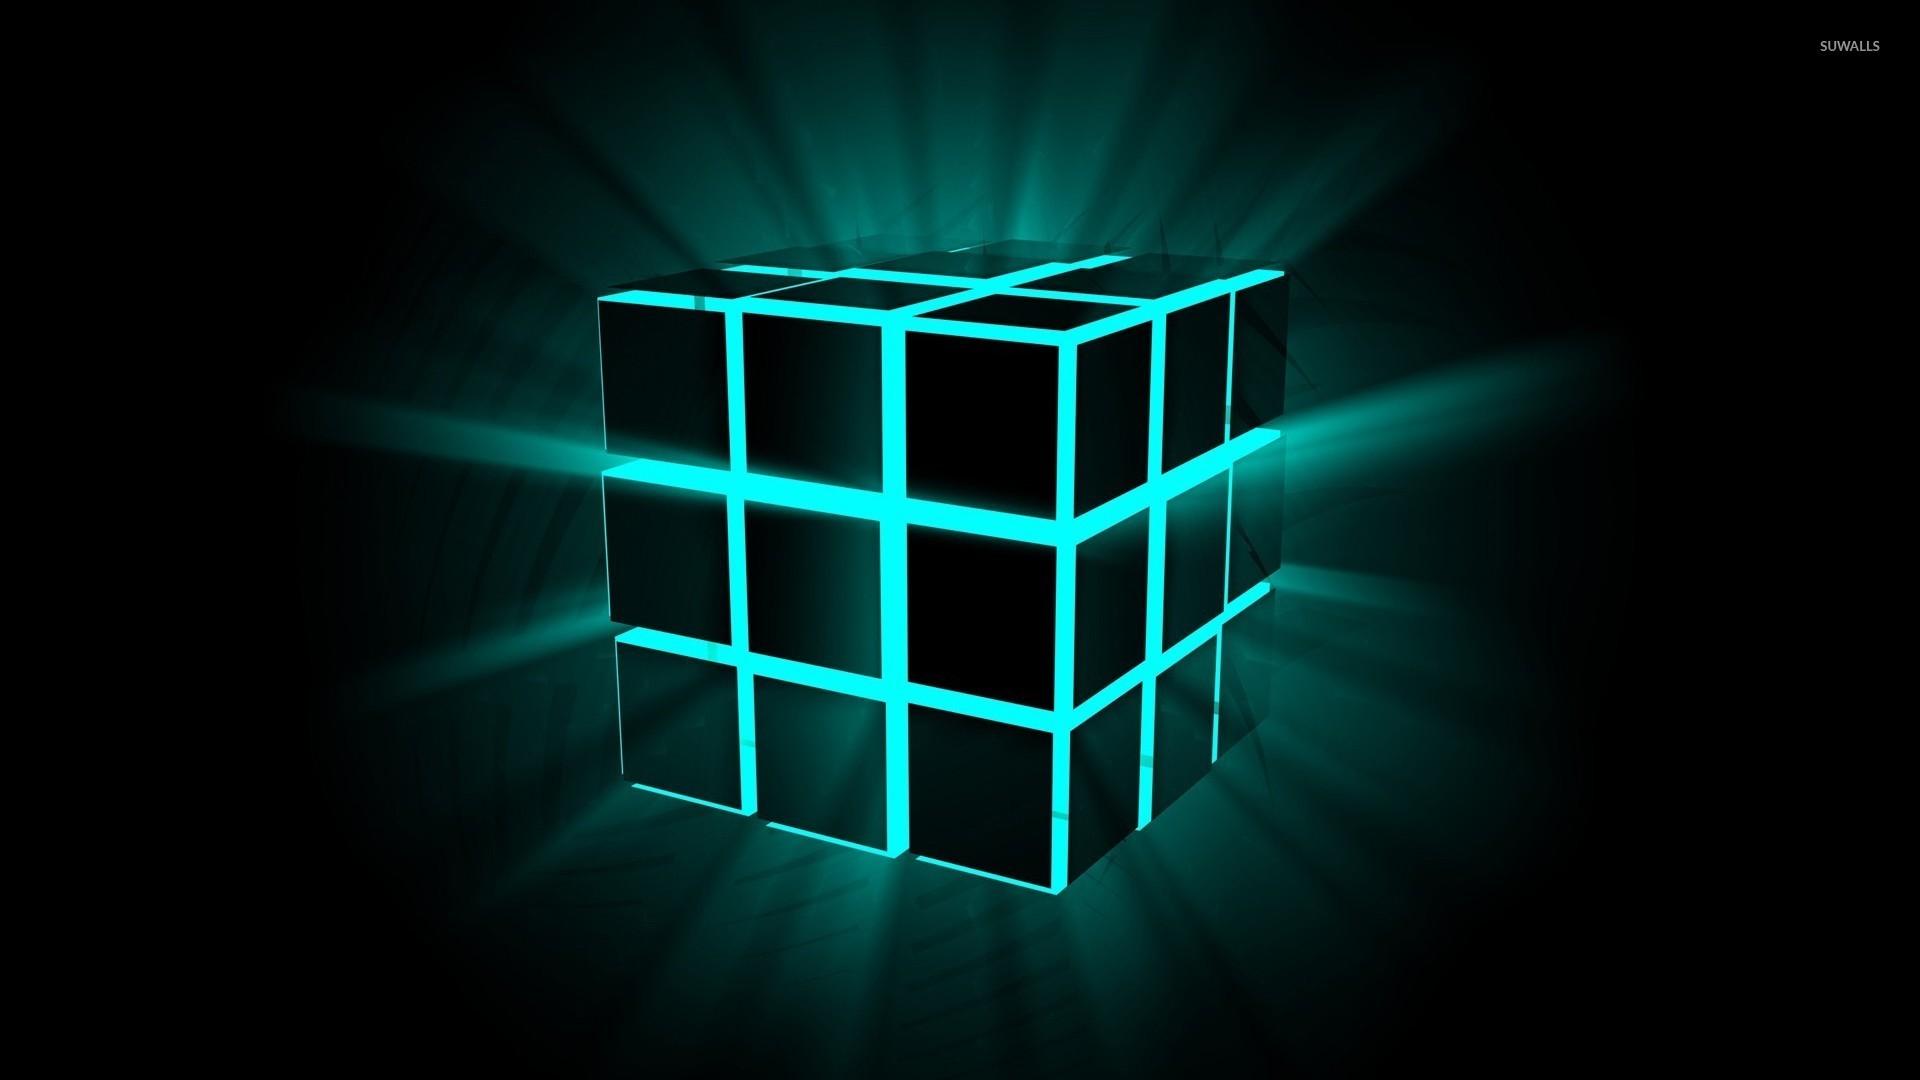 Neon cube wallpaper – 3D wallpapers – #23099